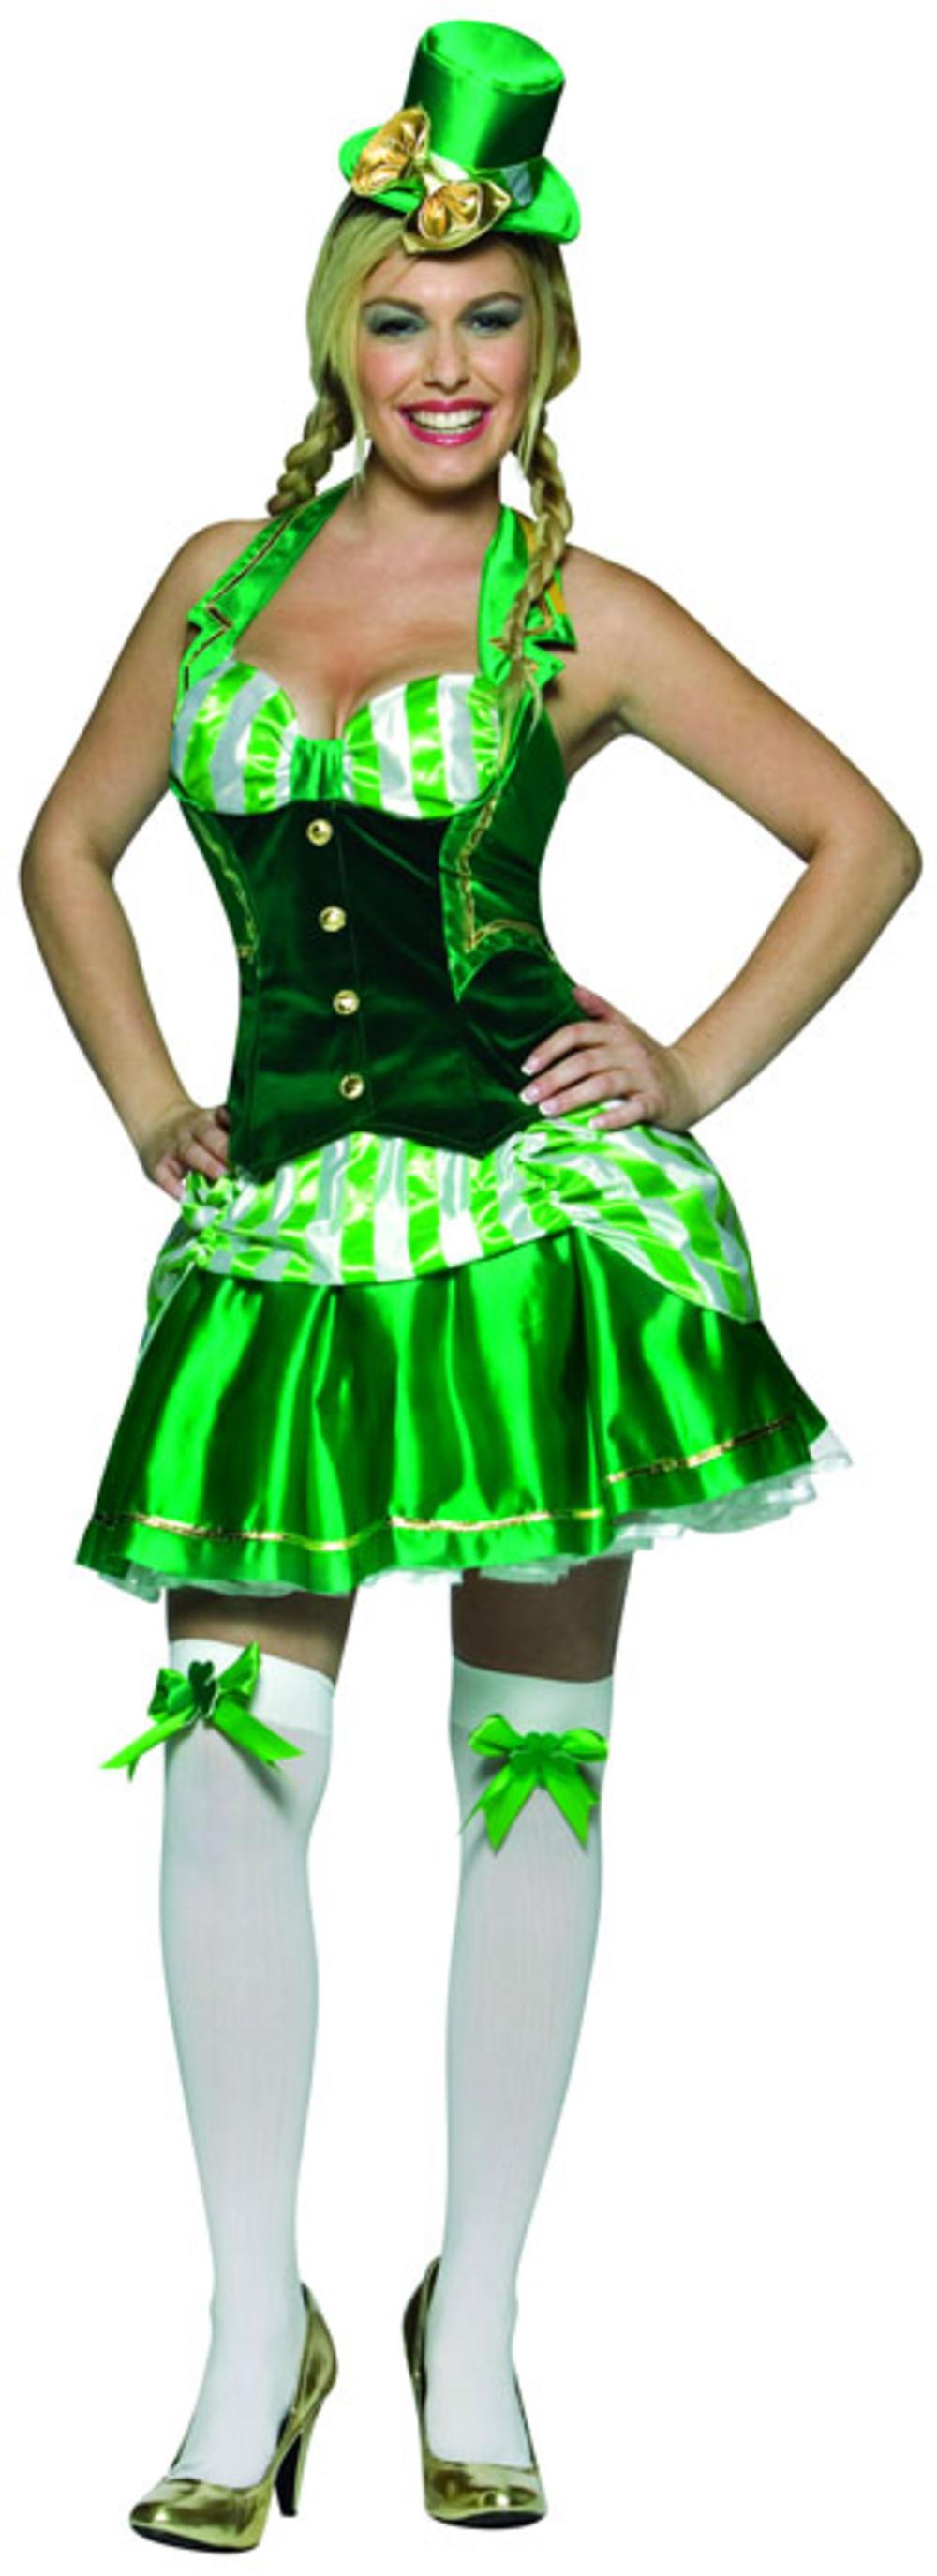 Shamrock Sweetheart Women's' Costume